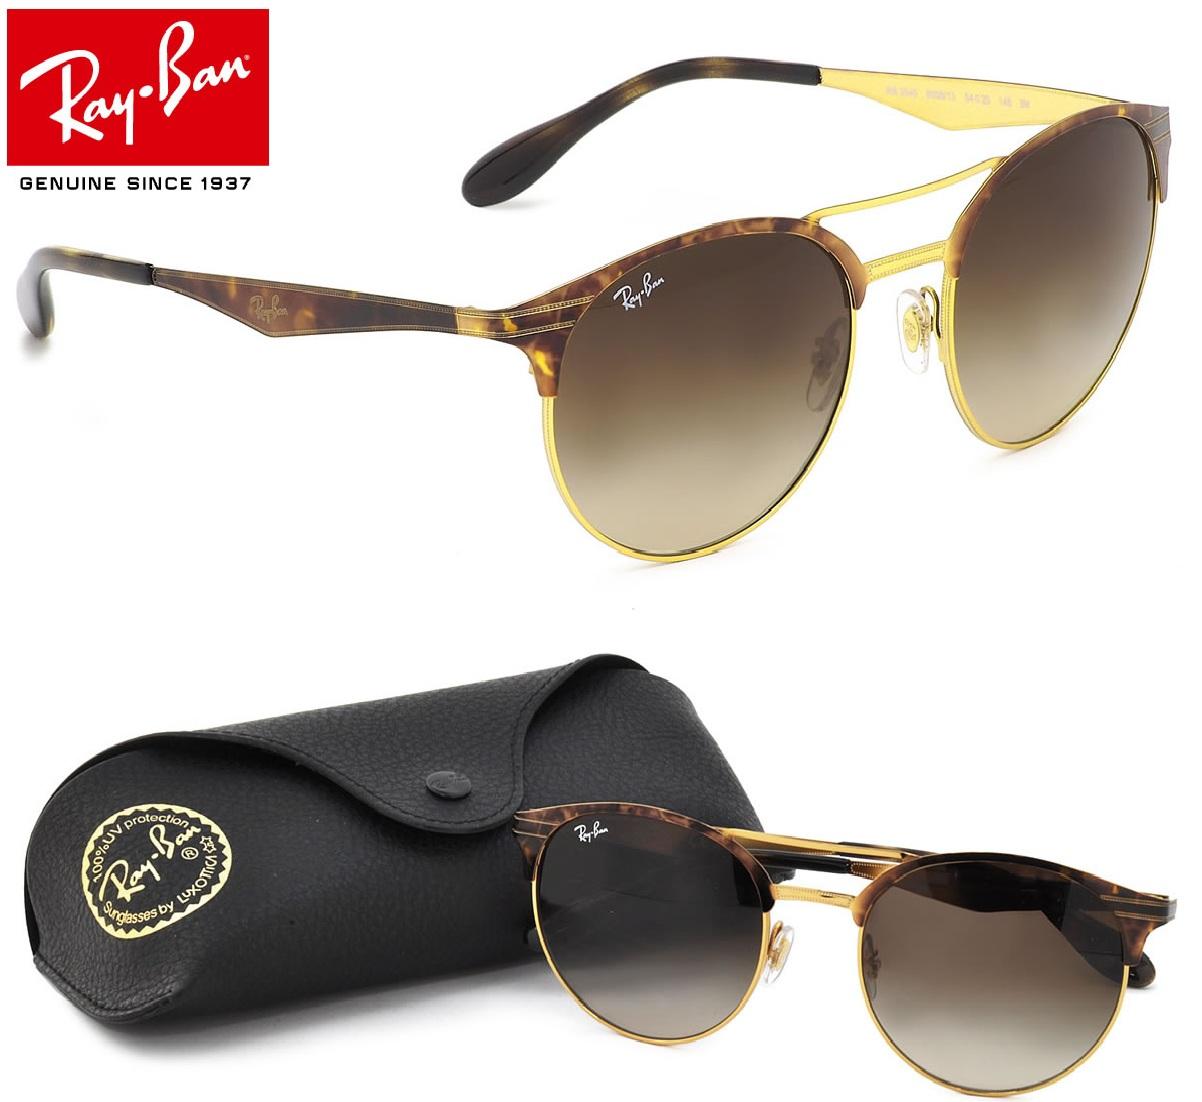 Ray Ban RB3545 naočare za sunce i futrola